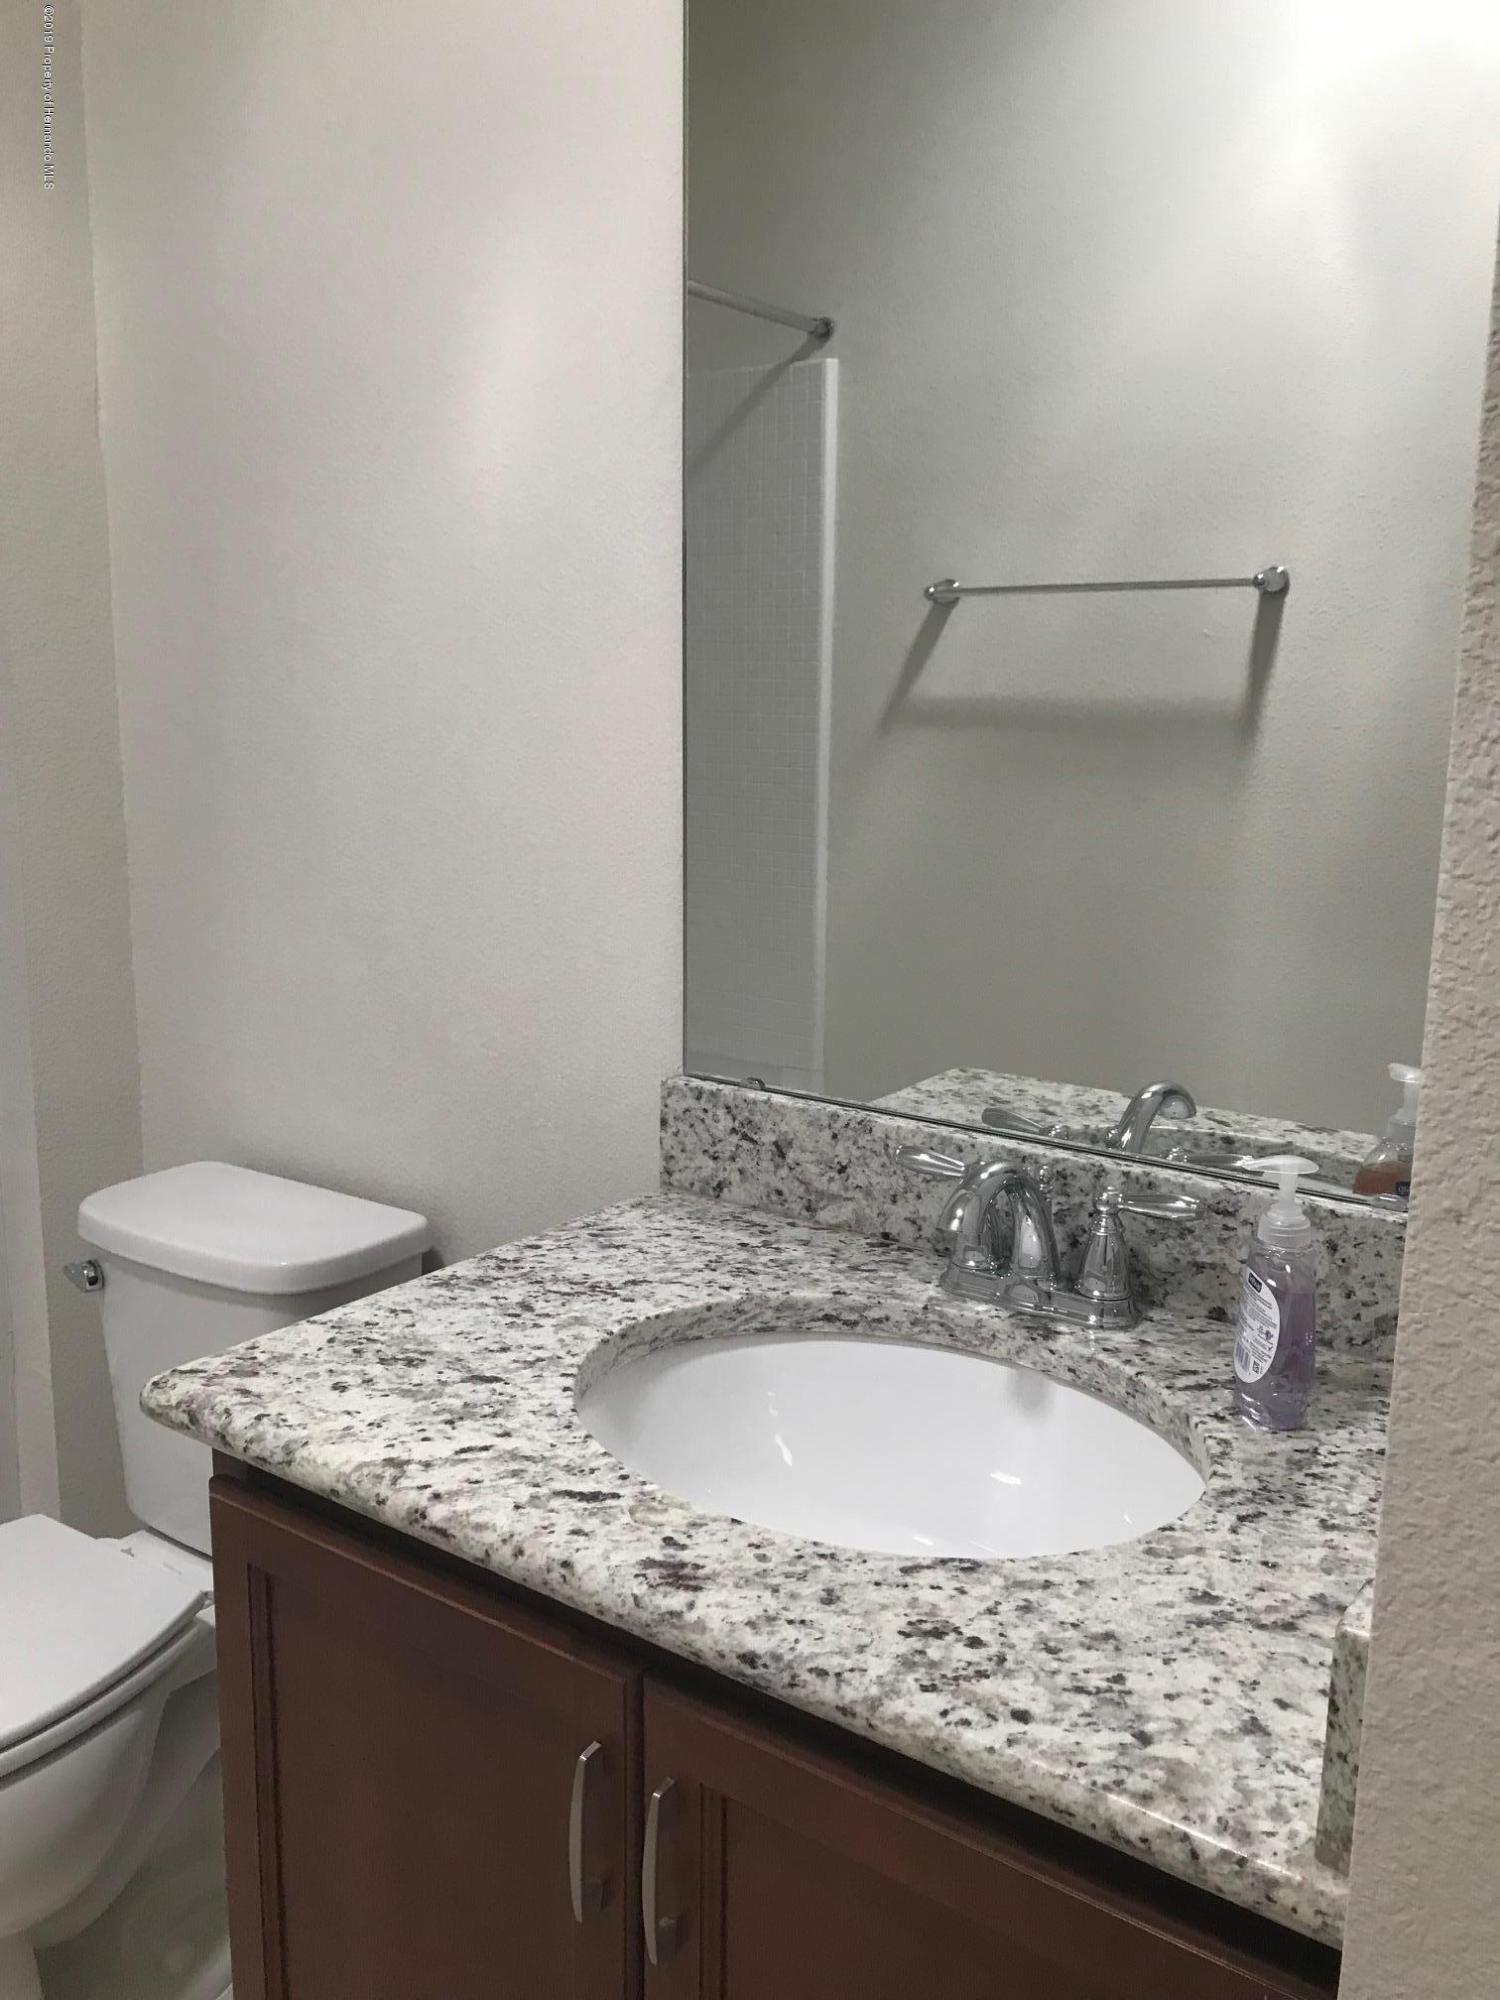 773 Petal Mist Lane, Brooksville, Florida 34604, 3 Bedrooms Bedrooms, ,2 BathroomsBathrooms,Residential,For Sale,Petal Mist,2203158